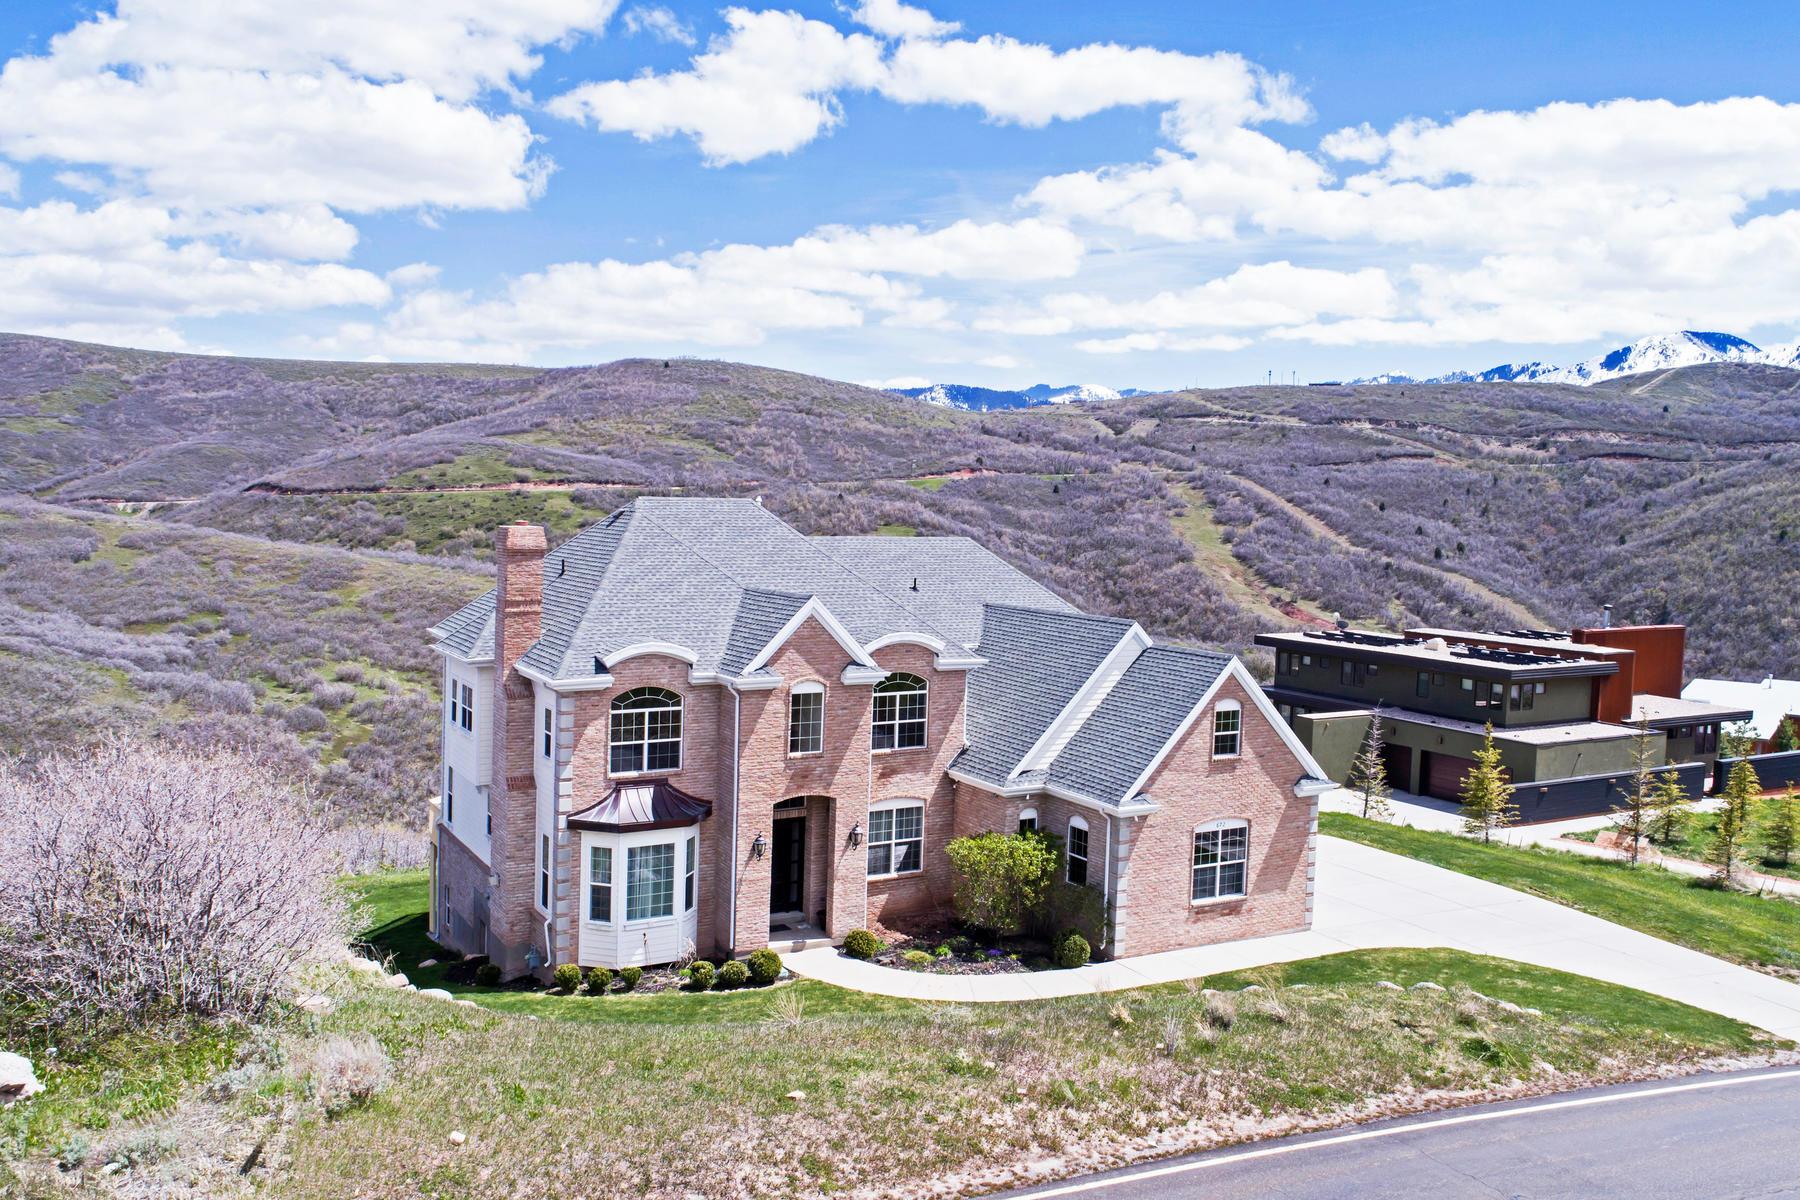 Villa per Vendita alle ore Stately Two-Story Home With Sweeping Views 672 N Pioneer Fork Rd Salt Lake City, Utah, 84108 Stati Uniti